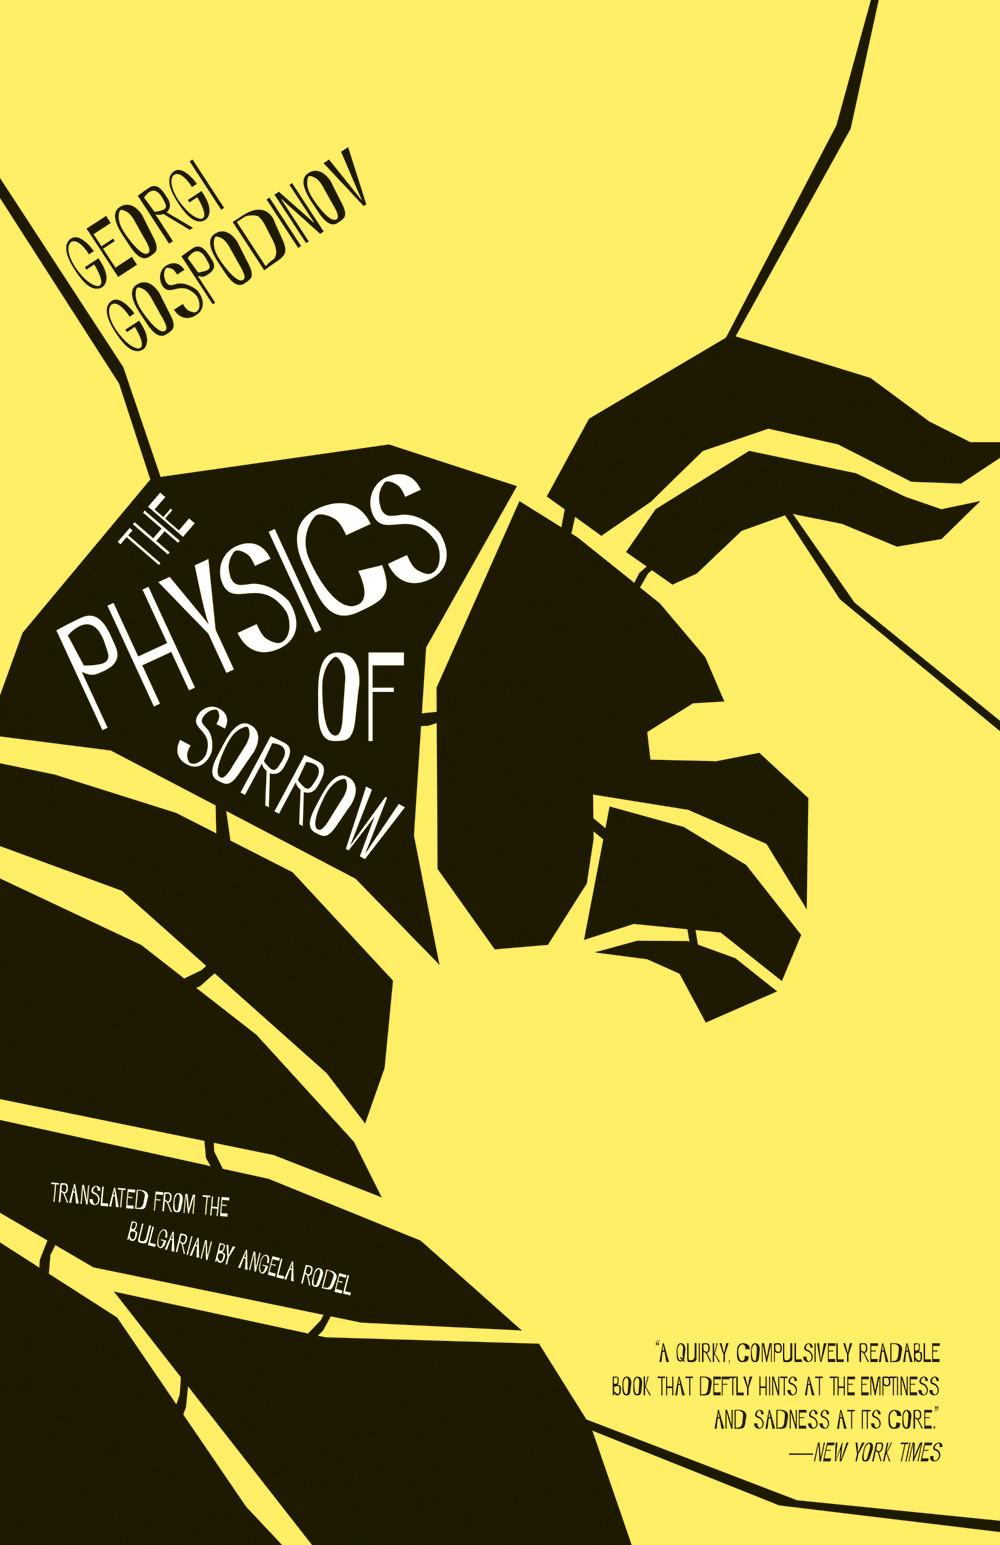 The Physics of Sorrow  by  Georgi Gospodinov  tr.  Angela Rodel  (Open Letter, April 2015)